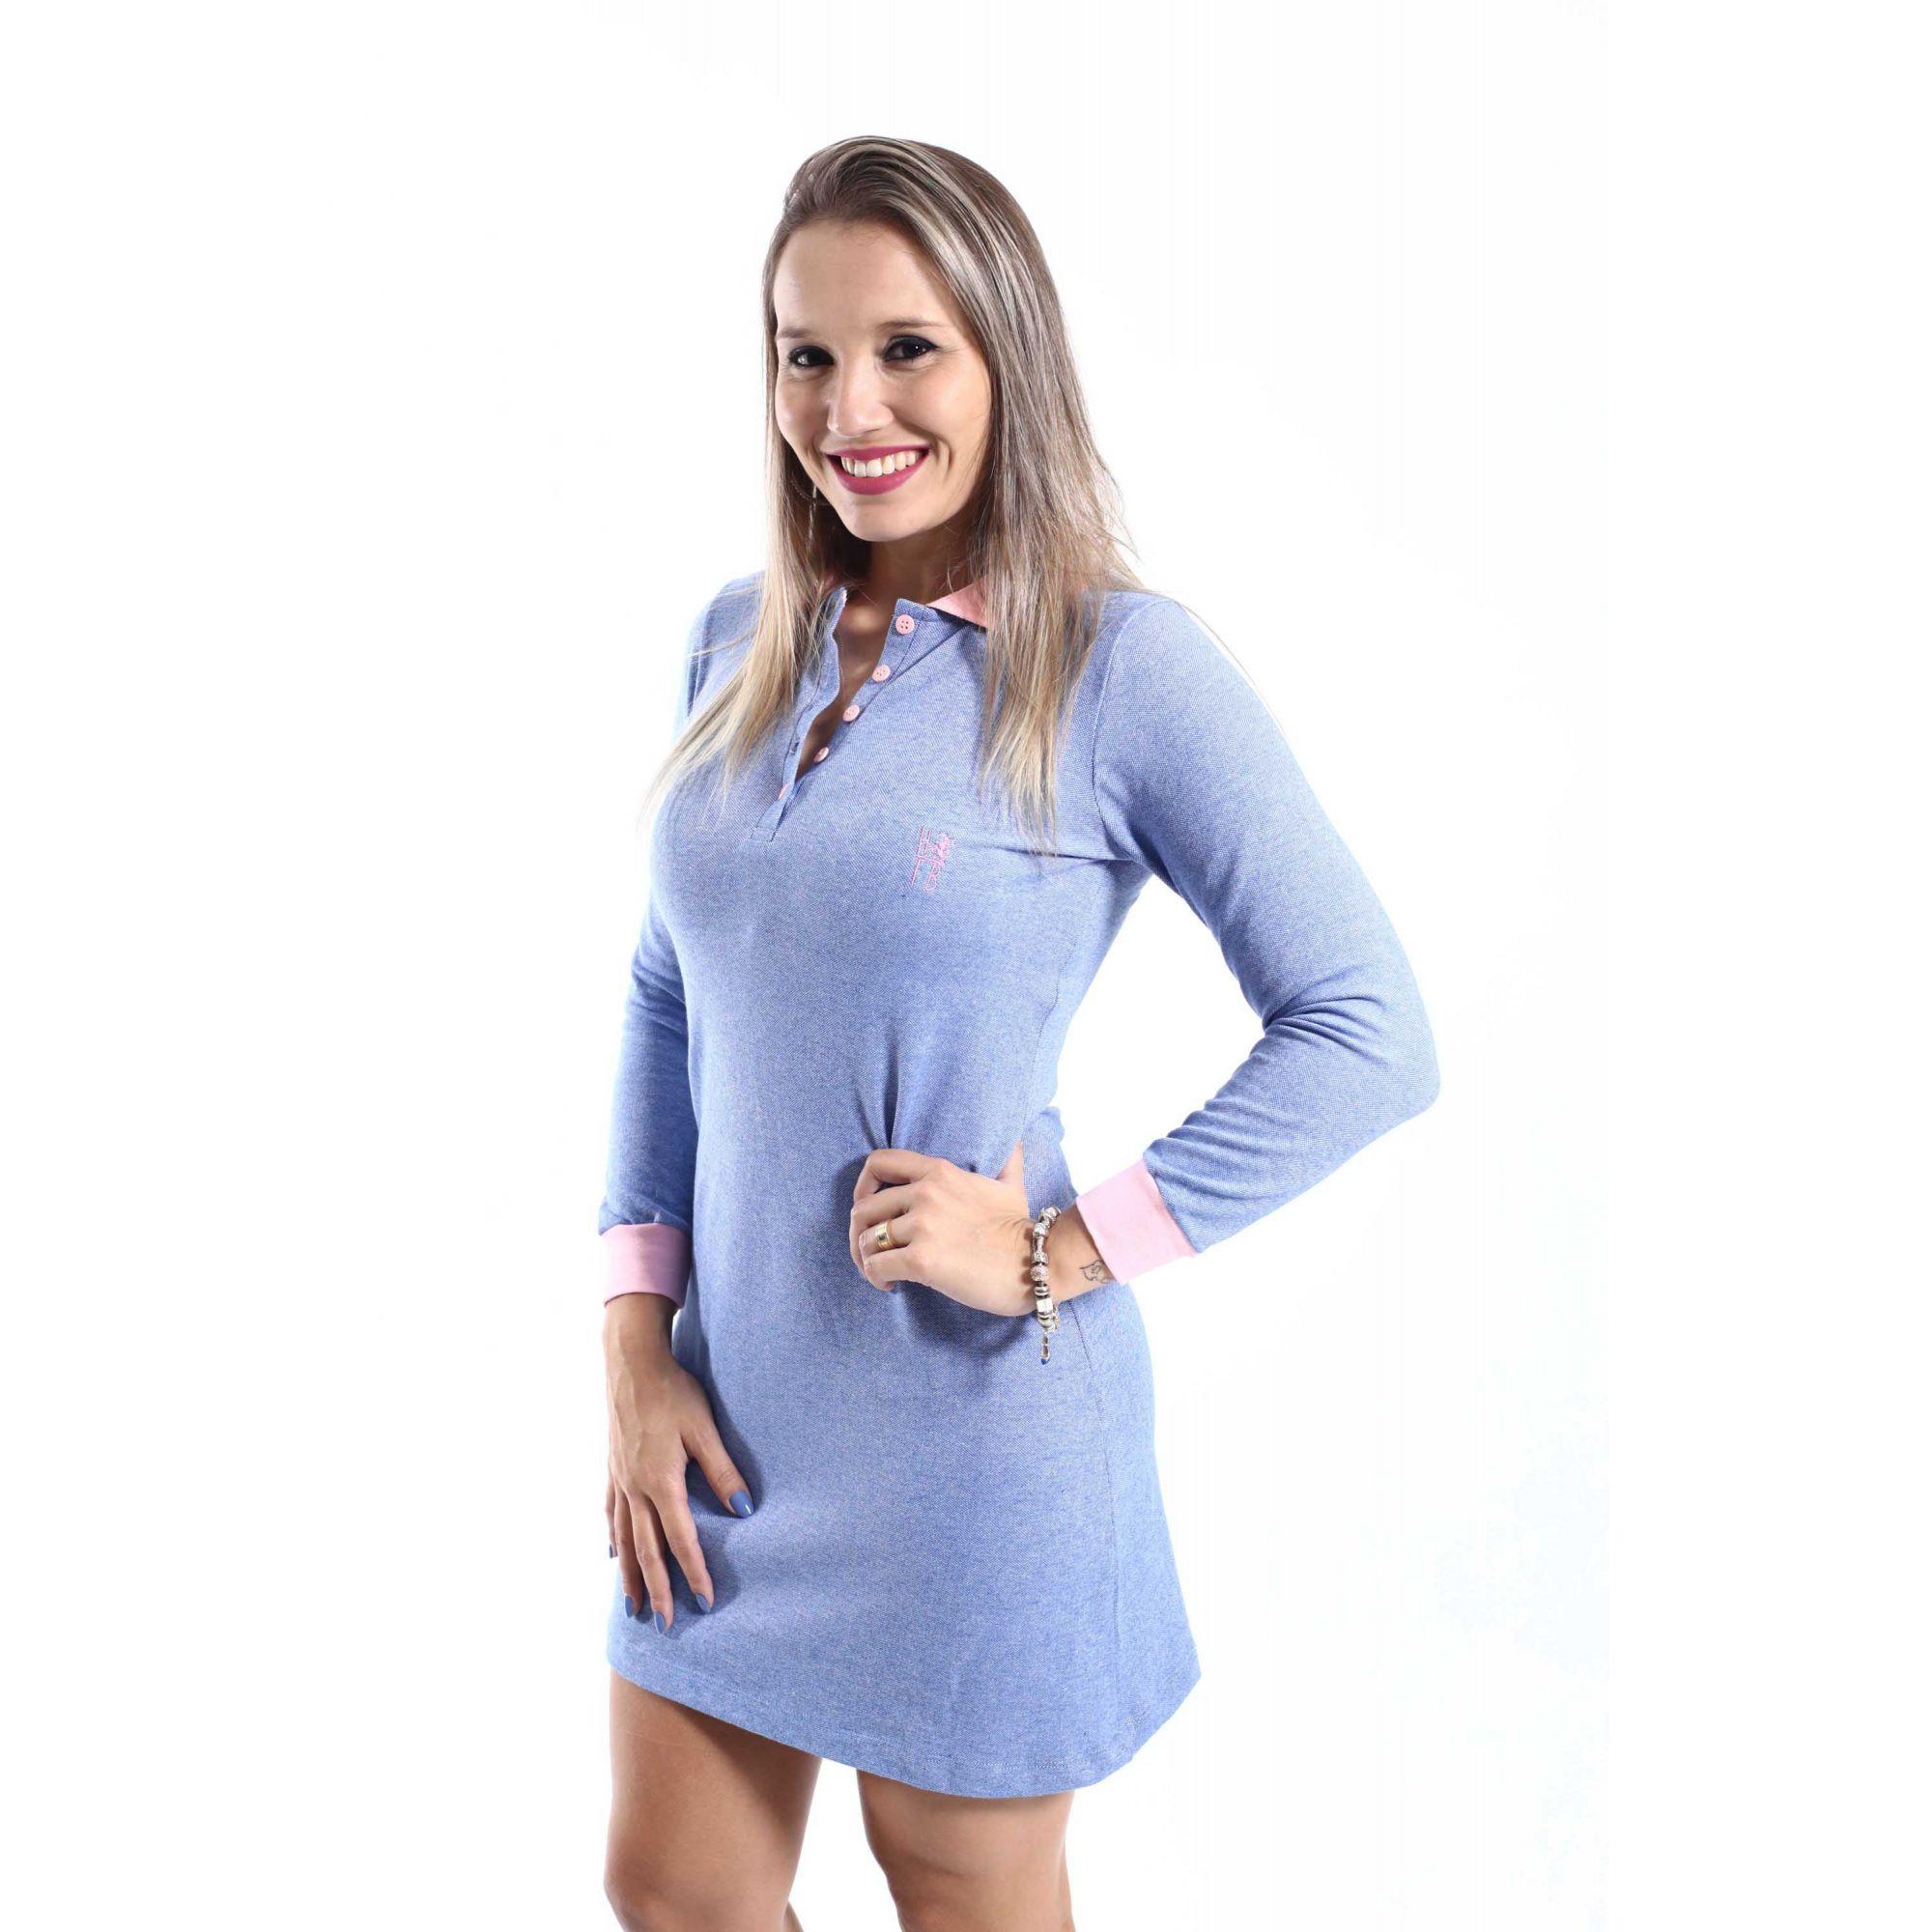 Vestido Manga Longa Azul  - Heitor Fashion Brazil